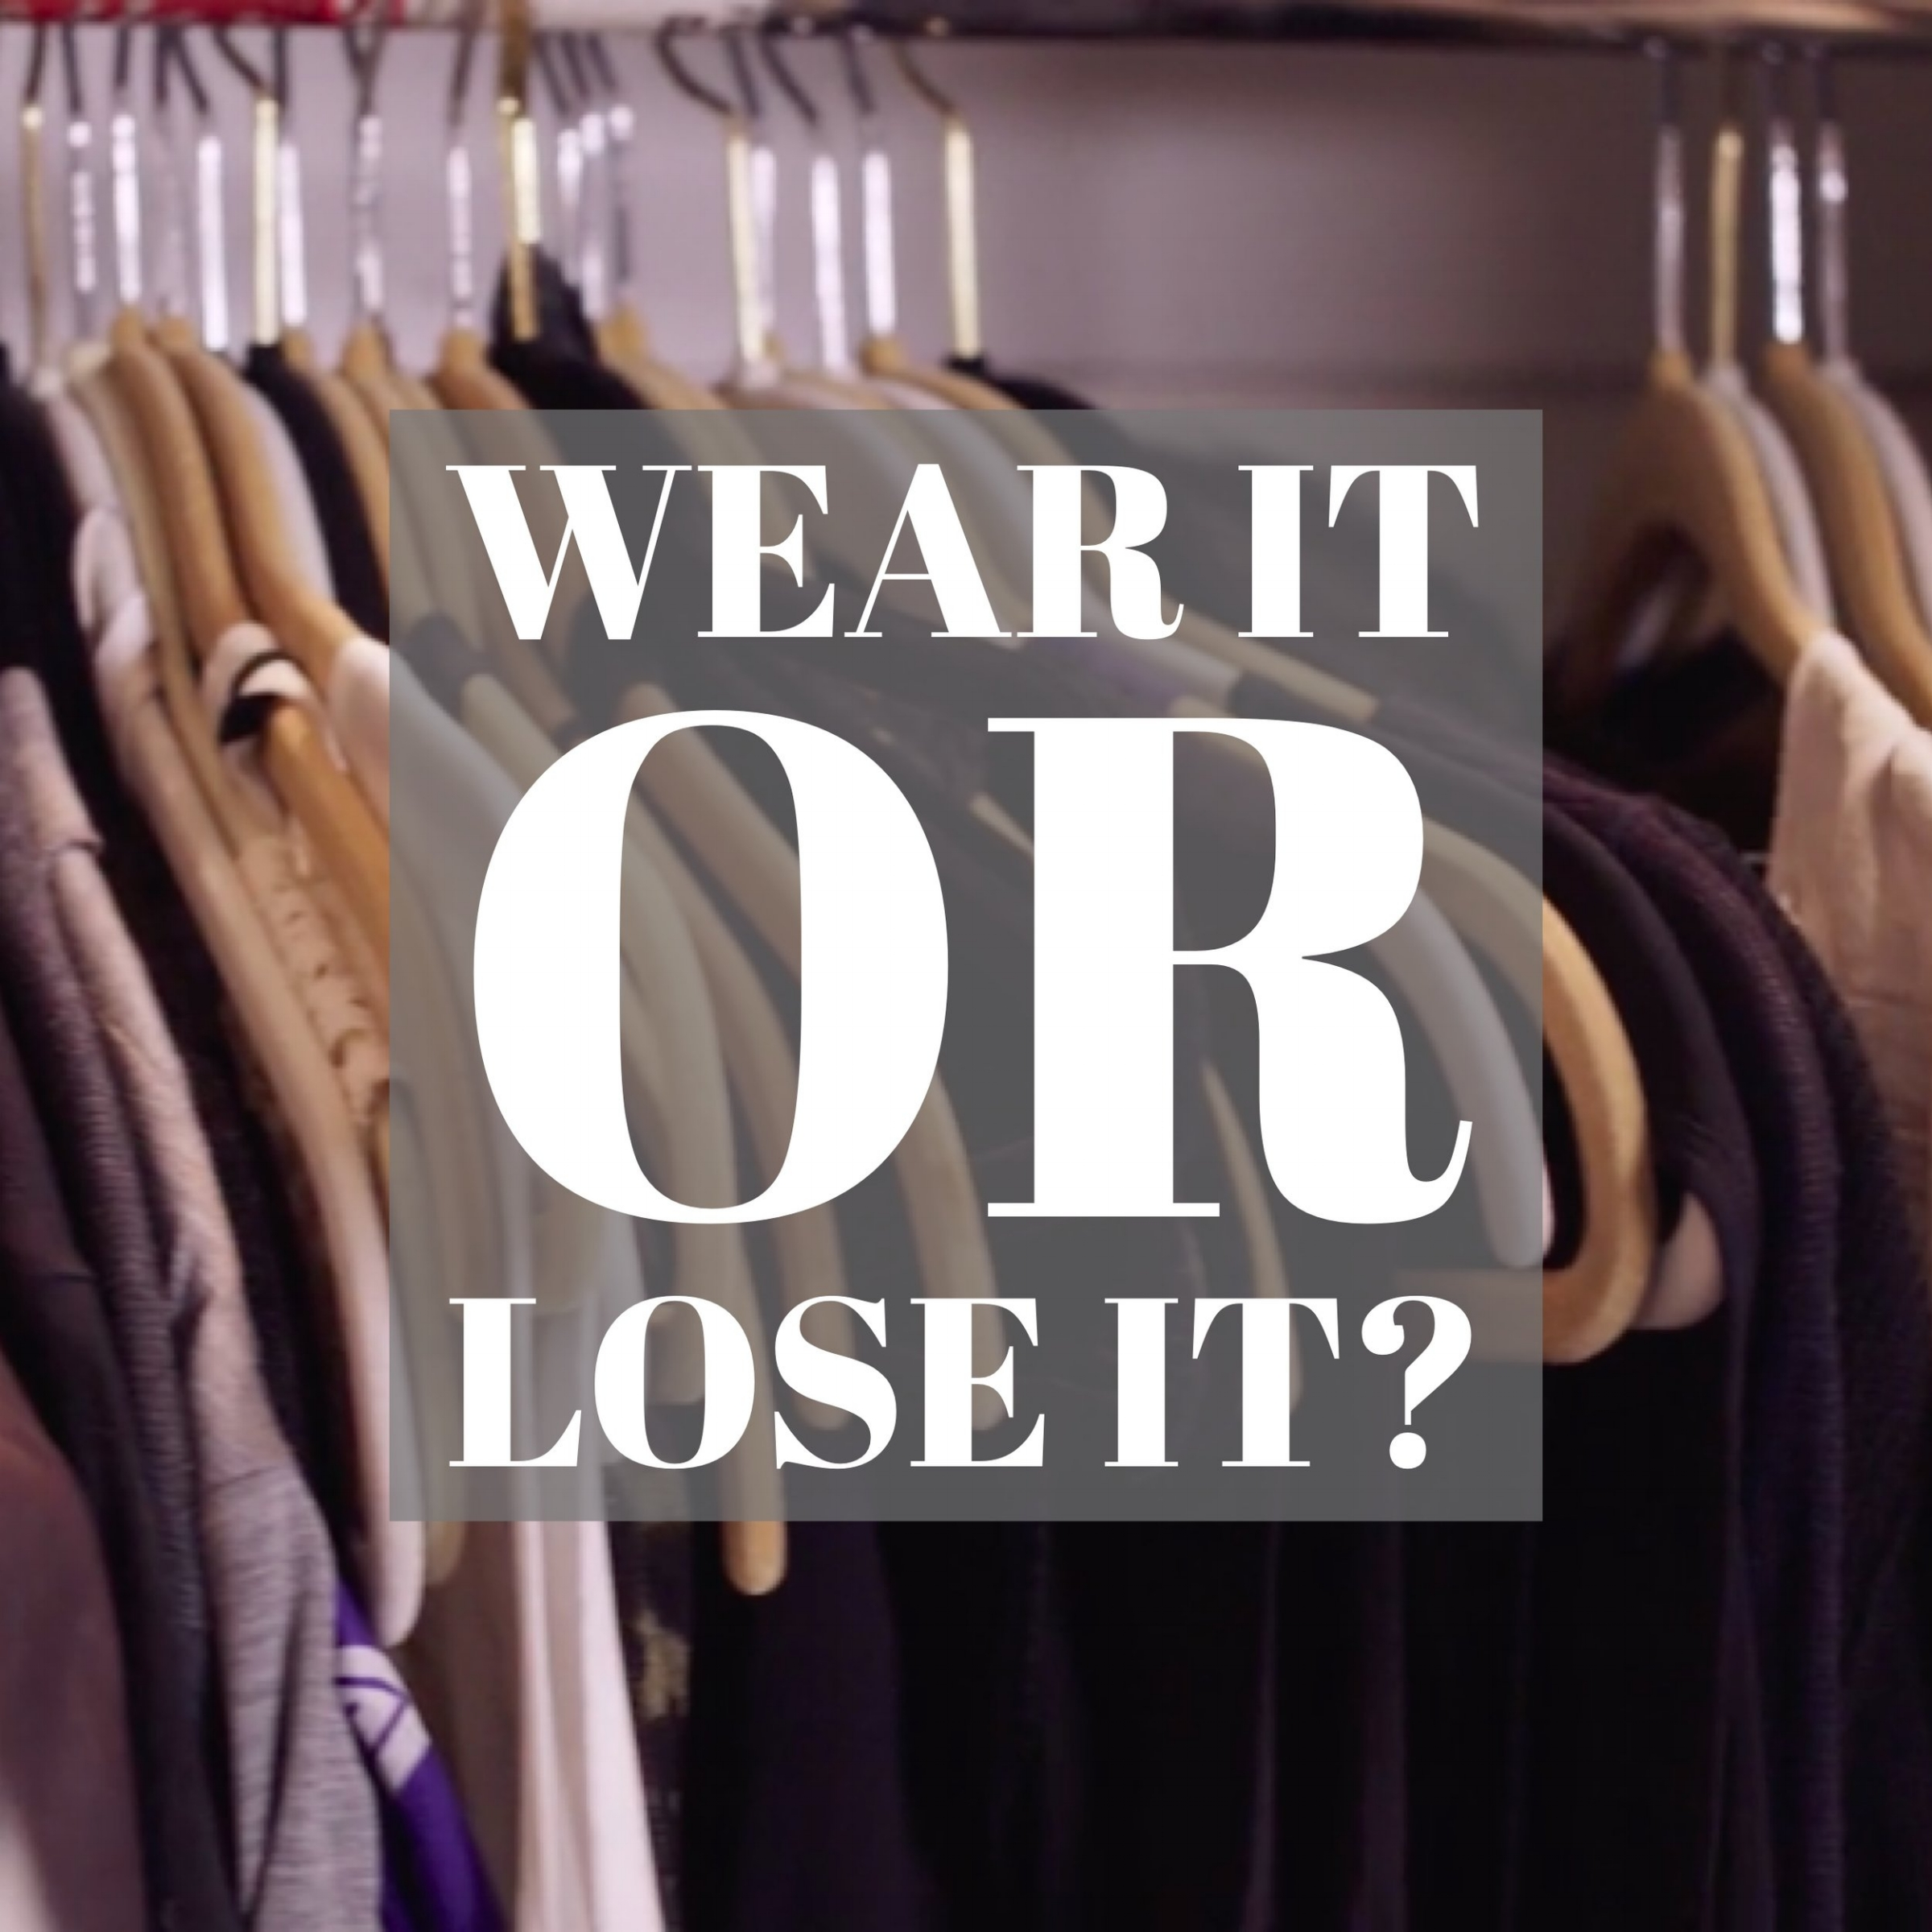 wear_your_whole_closet_challenge_wear_it_or_lose_it